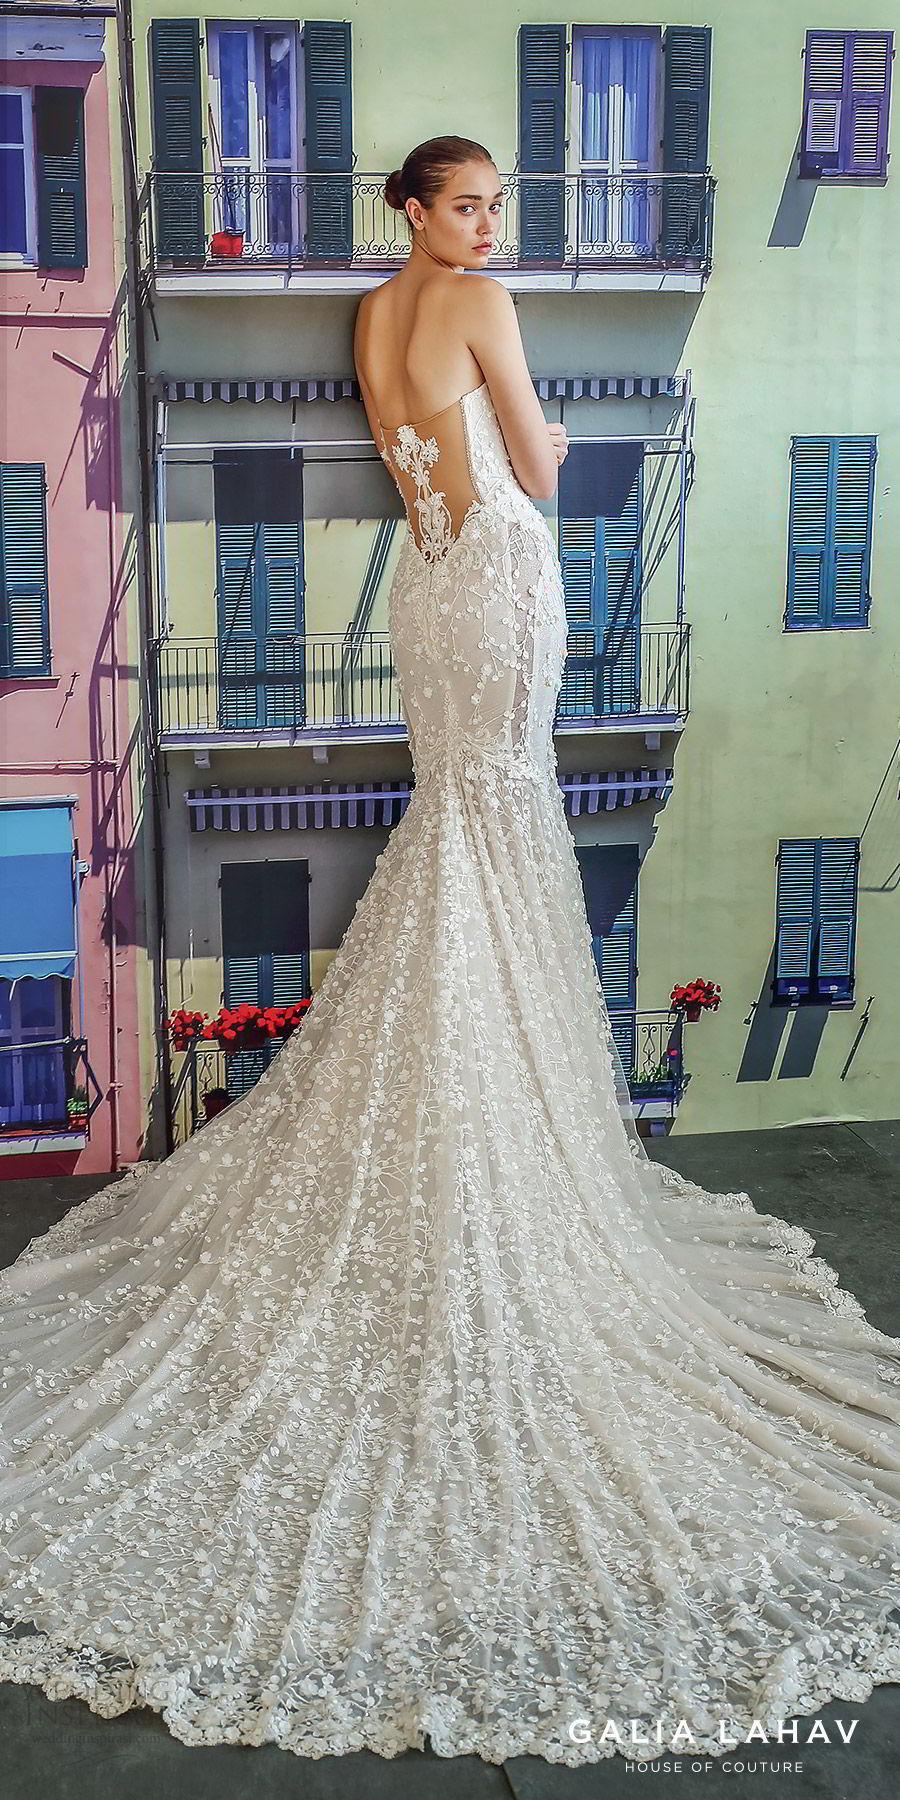 galia lahav fall 2019 bridal strapless sweetheart keyhole bodice fully embroidered lace mermaid wedding dress cathedral train illusion back (camilla) bv